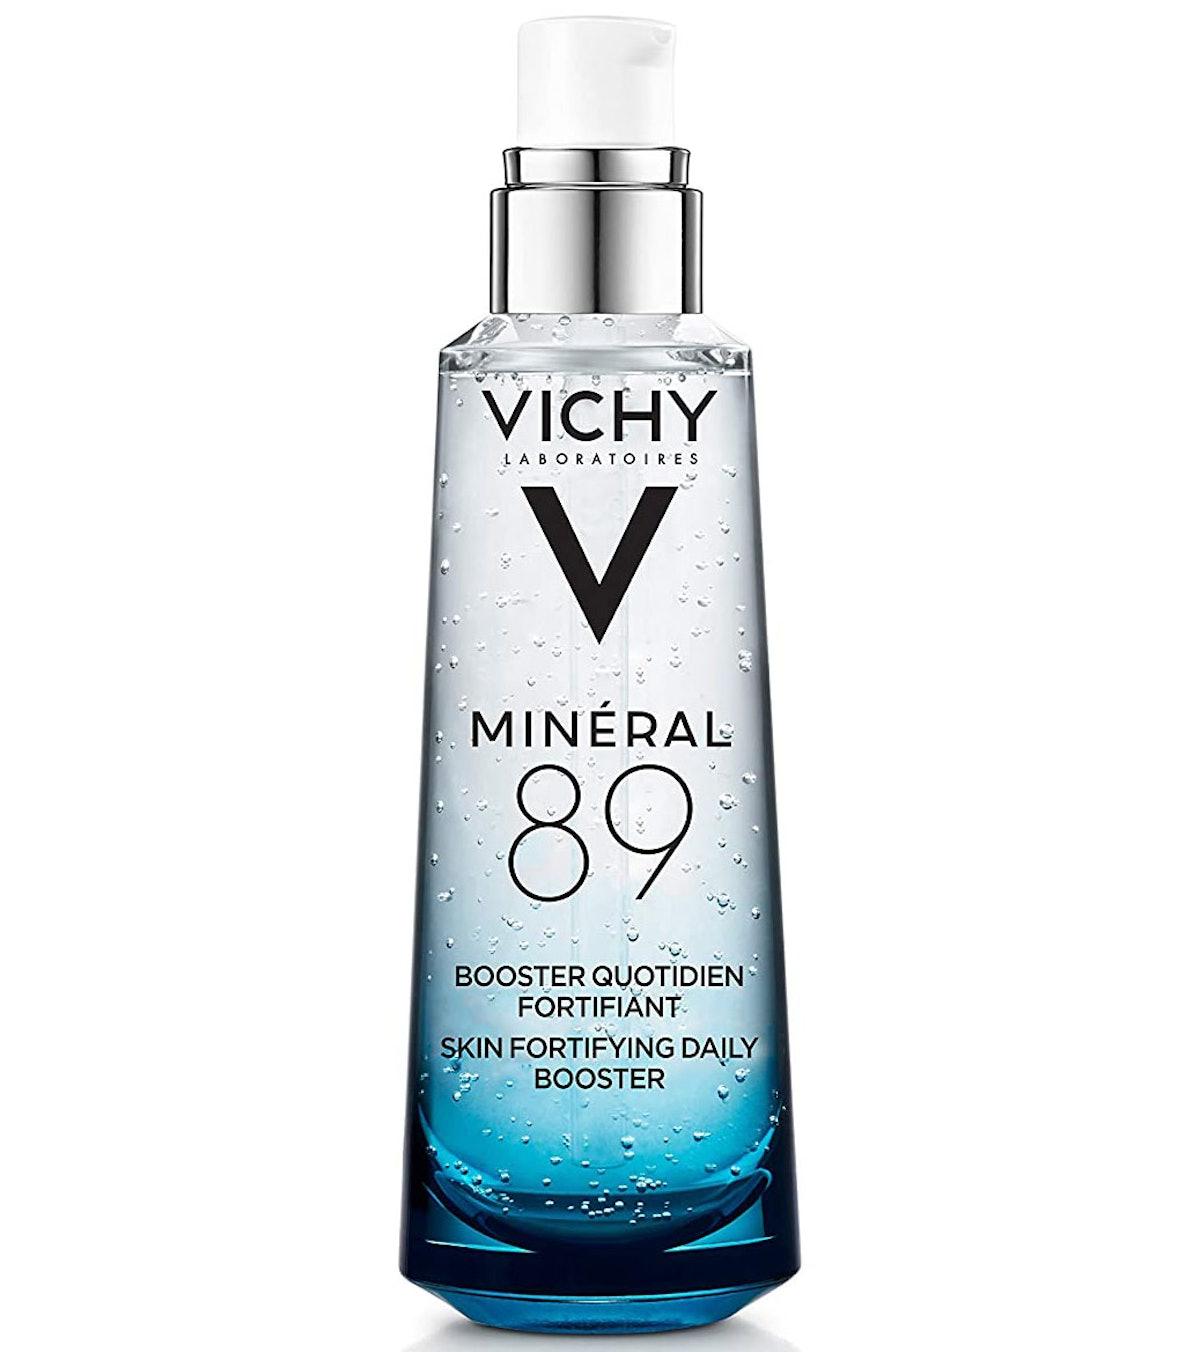 Vichy Minéral 89 Serum